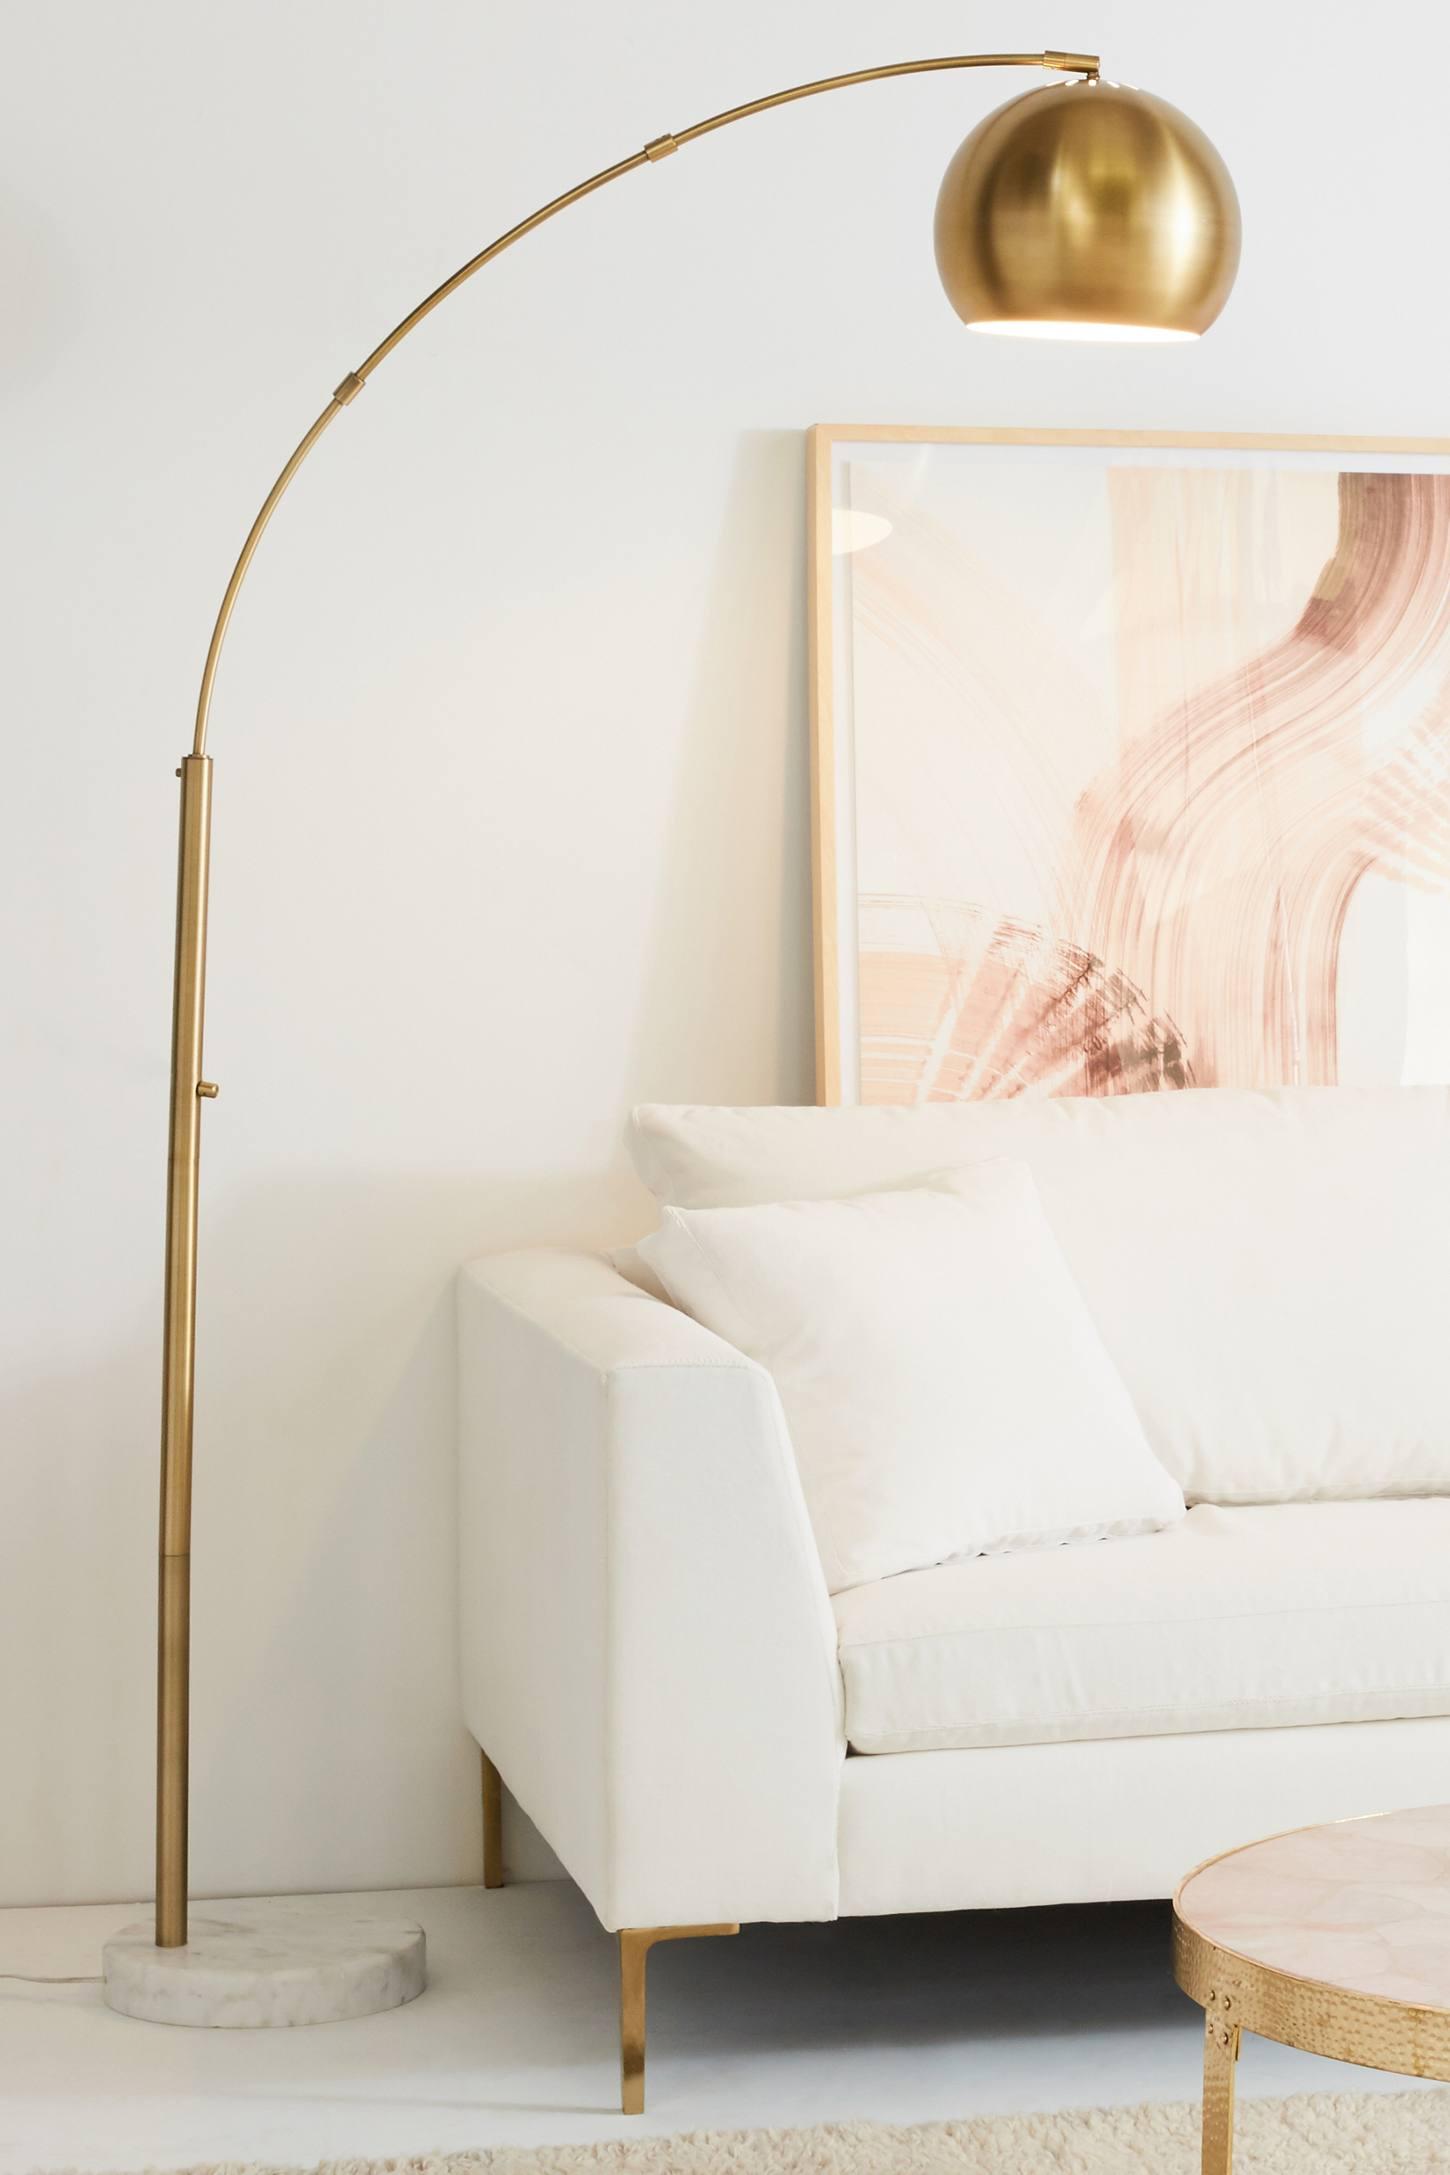 lamps for living room wall tiles mumbai six floor ideas your decor